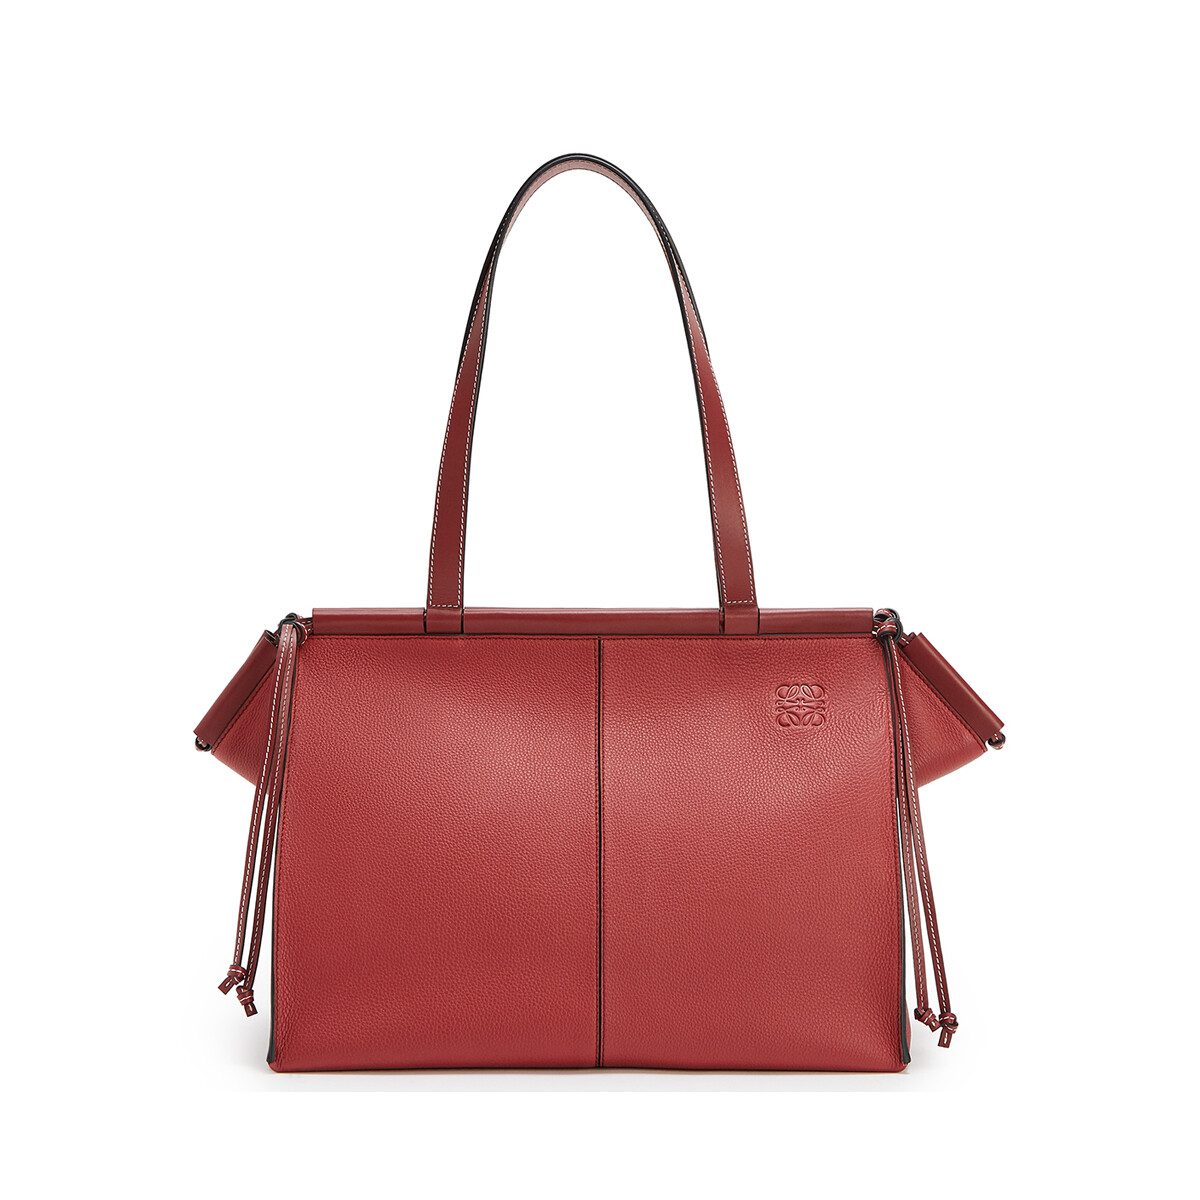 LOEWE Cushion Tote Bag Garnet front